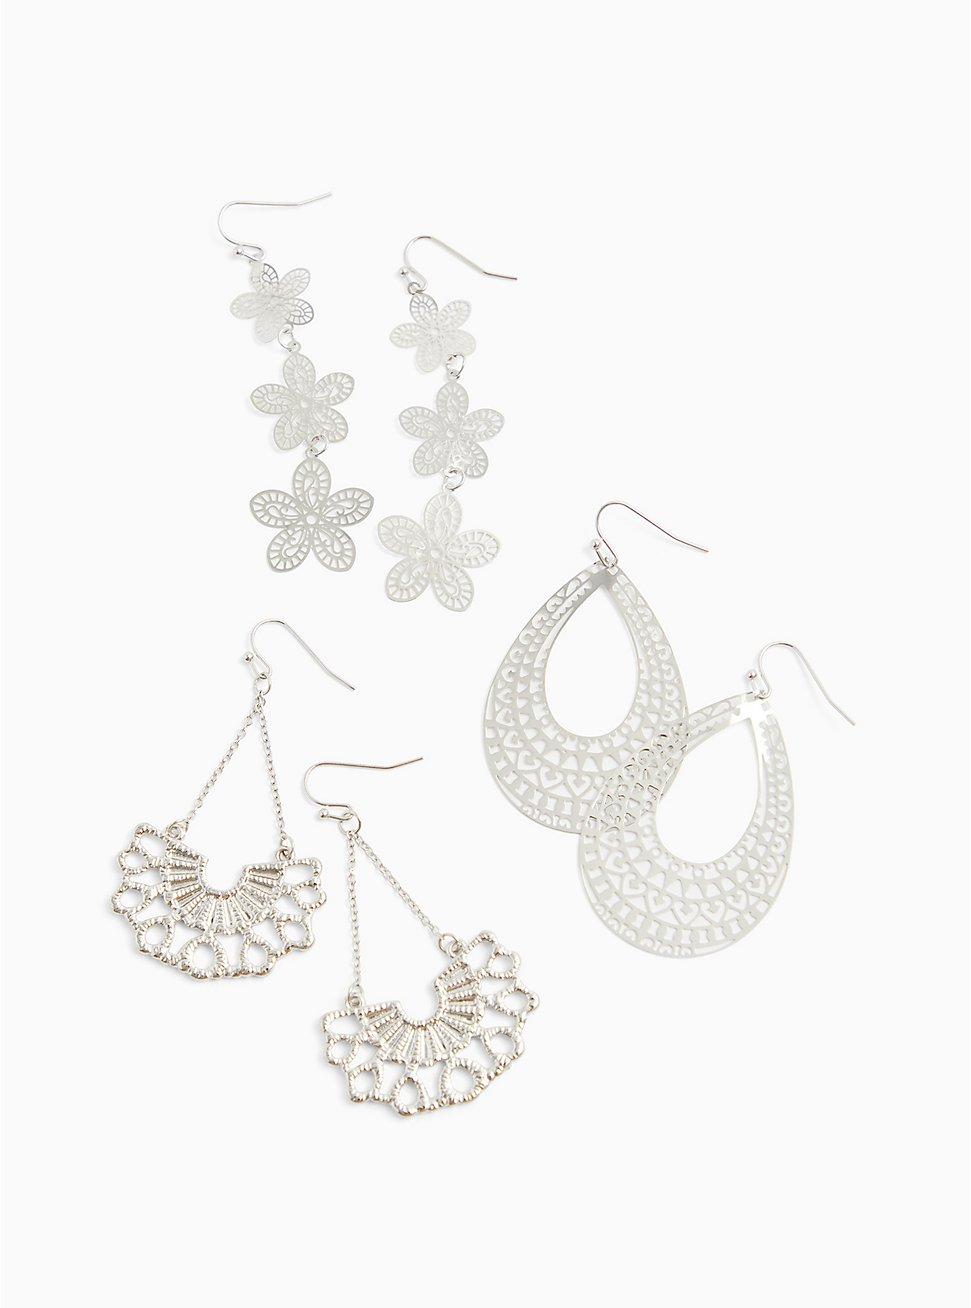 Plus Size Silver-Tone Floral Filigree Earrings Set - Set of 3, , hi-res